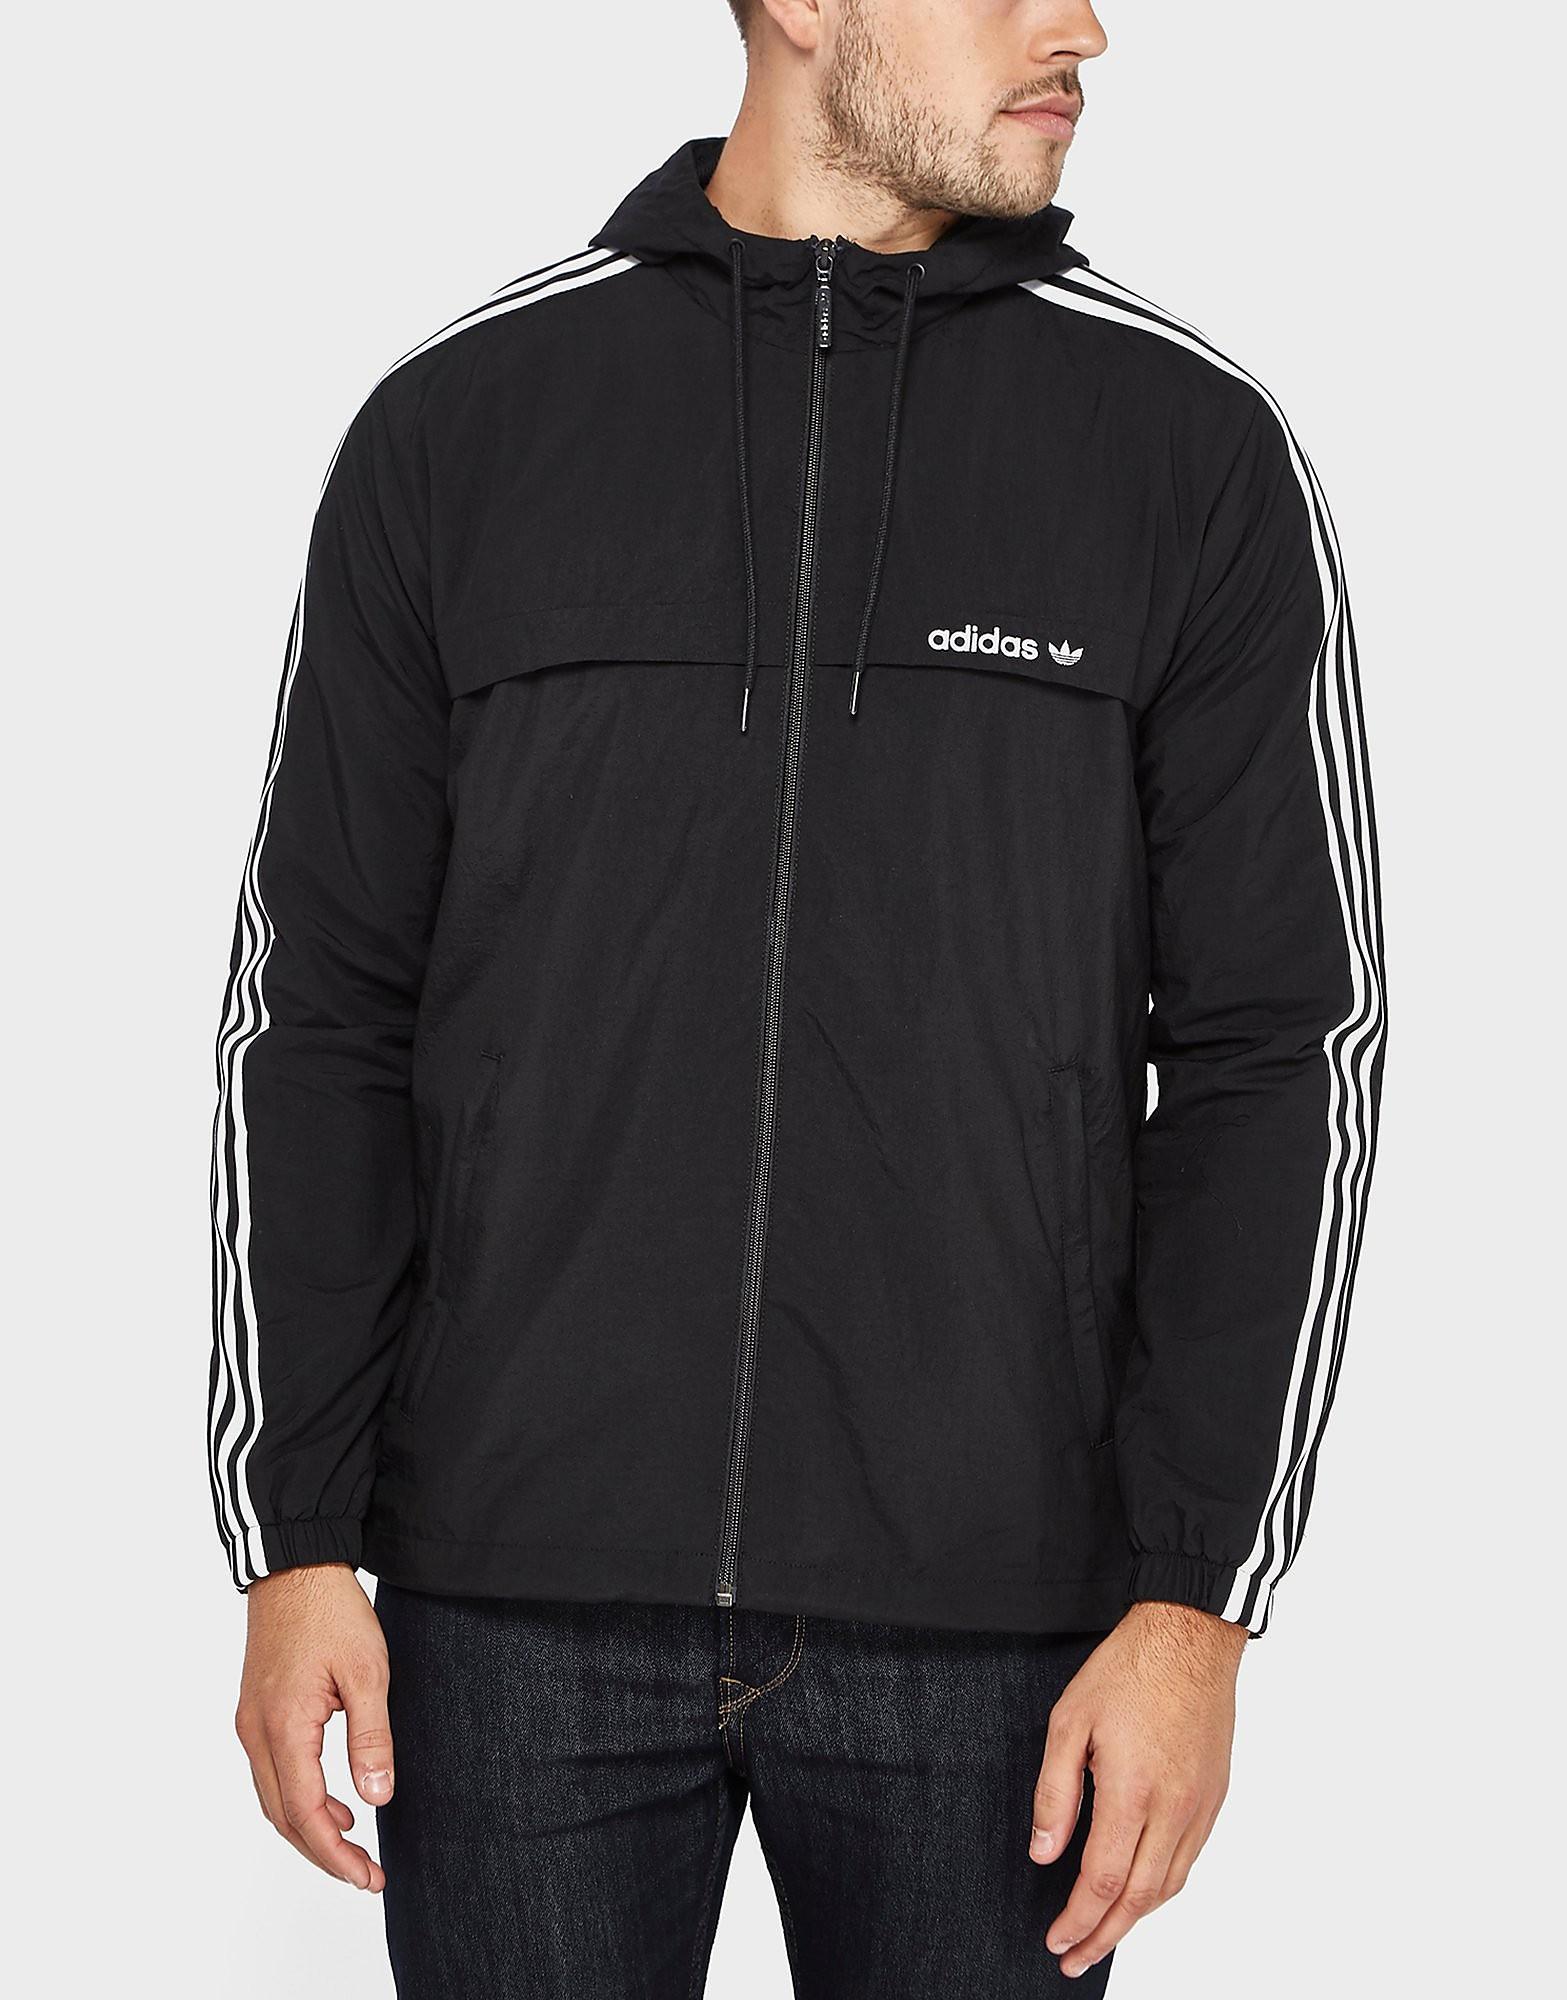 adidas Originals 3-Stripe Jacket